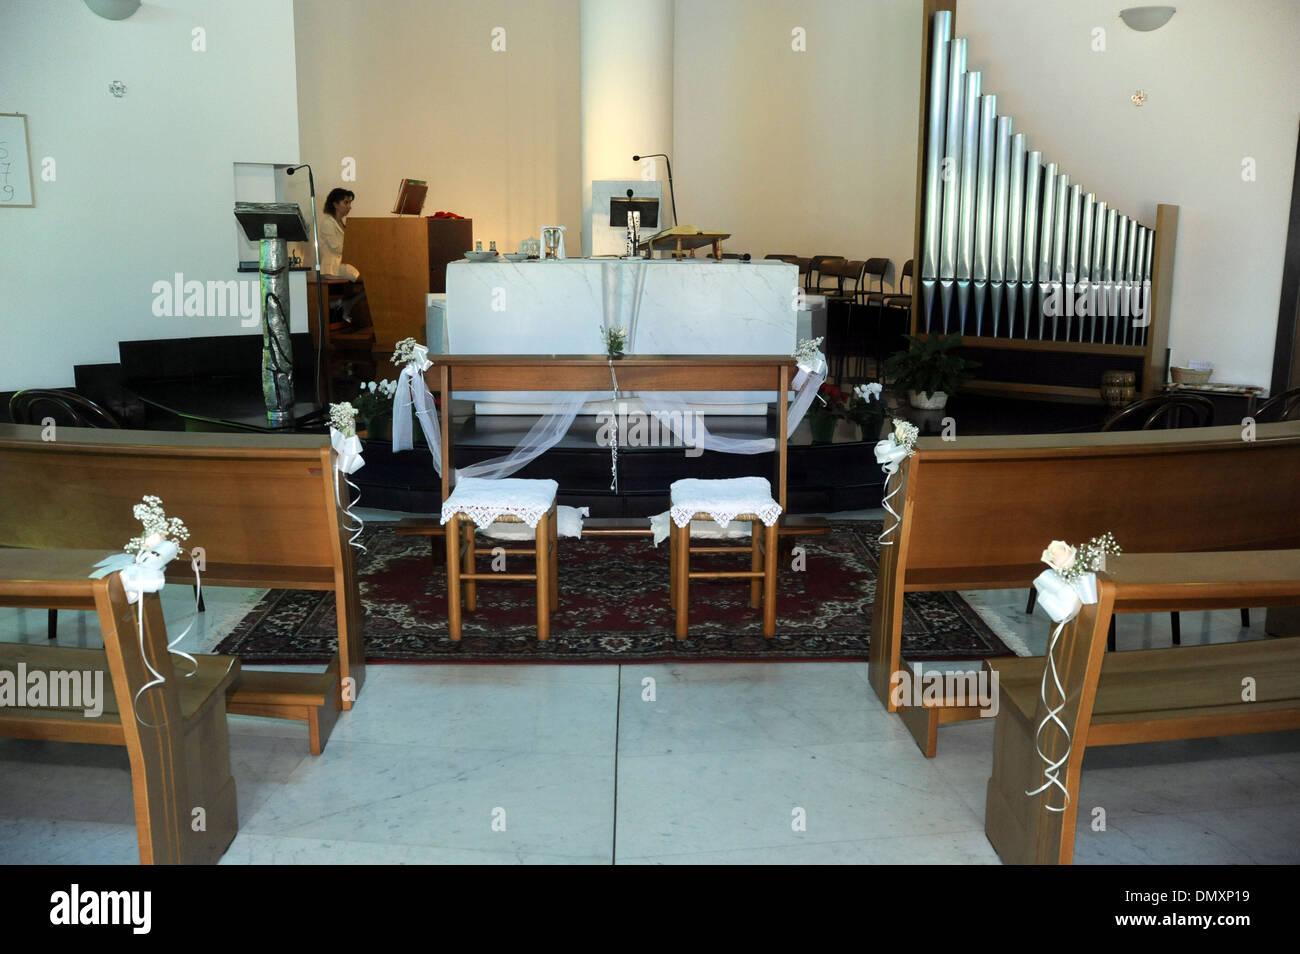 Italian Wedding Floral Decorations Church And Restaurant